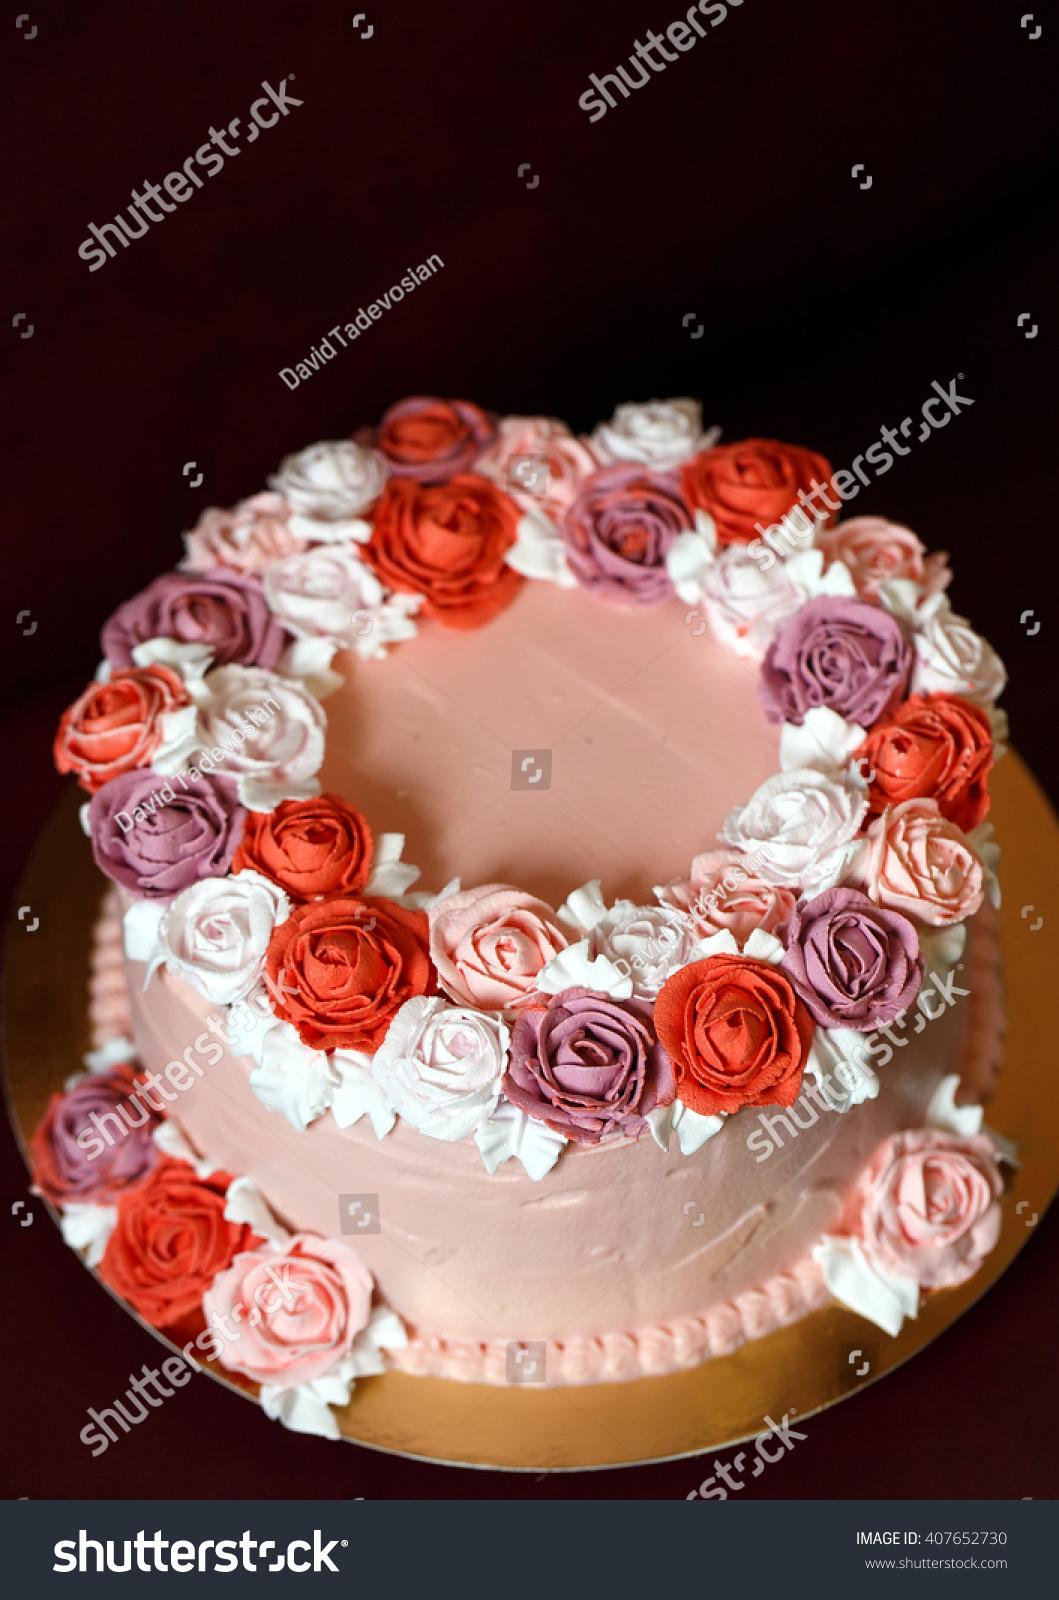 Birthday Cake Red Roses Stock Photo Edit Now 407652730 Shutterstock